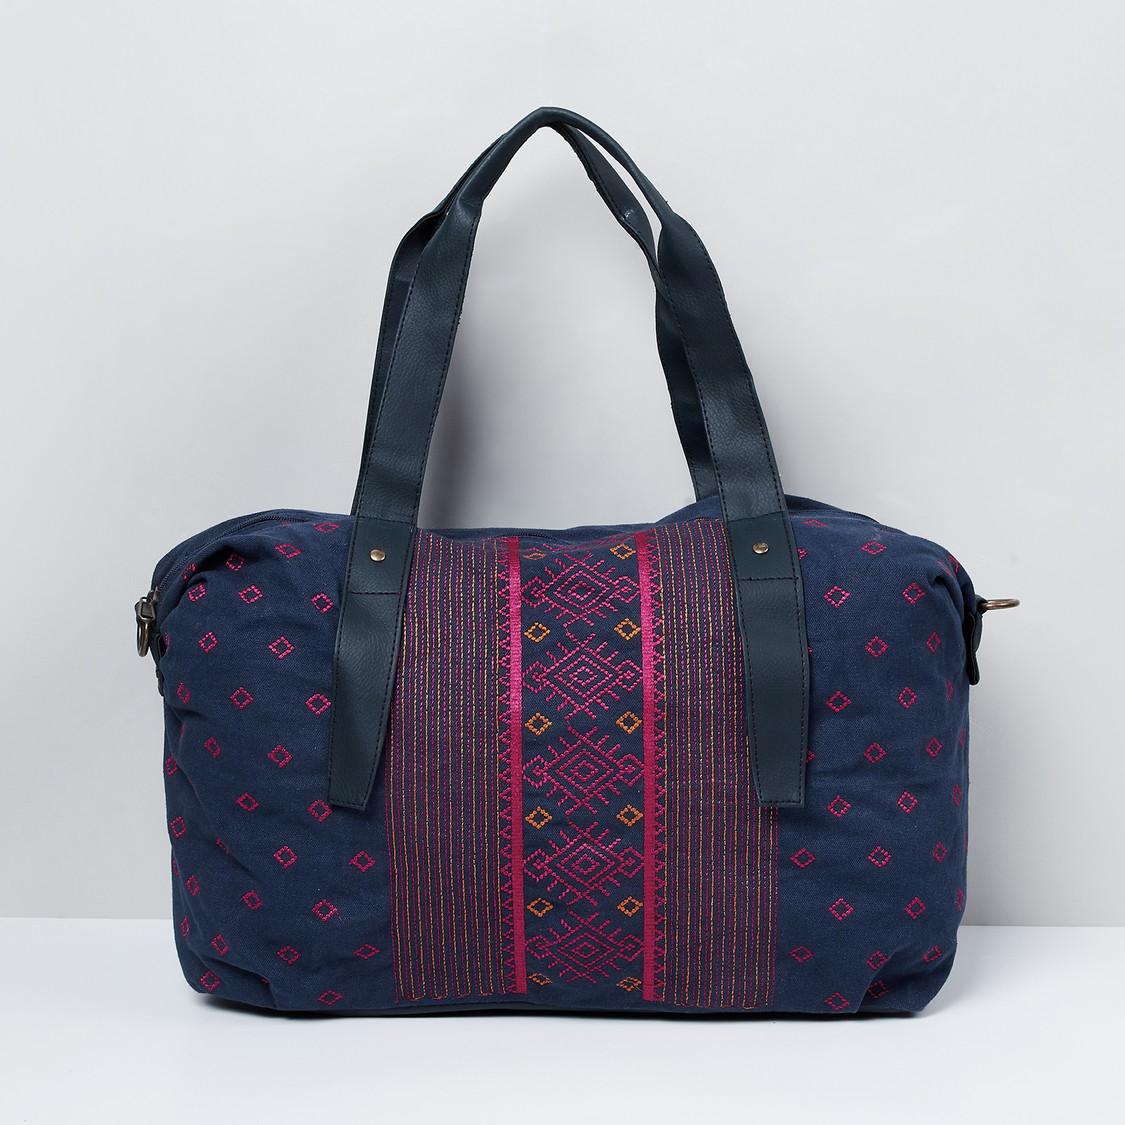 MAX Embroidered Zip-Closure Duffle Bag